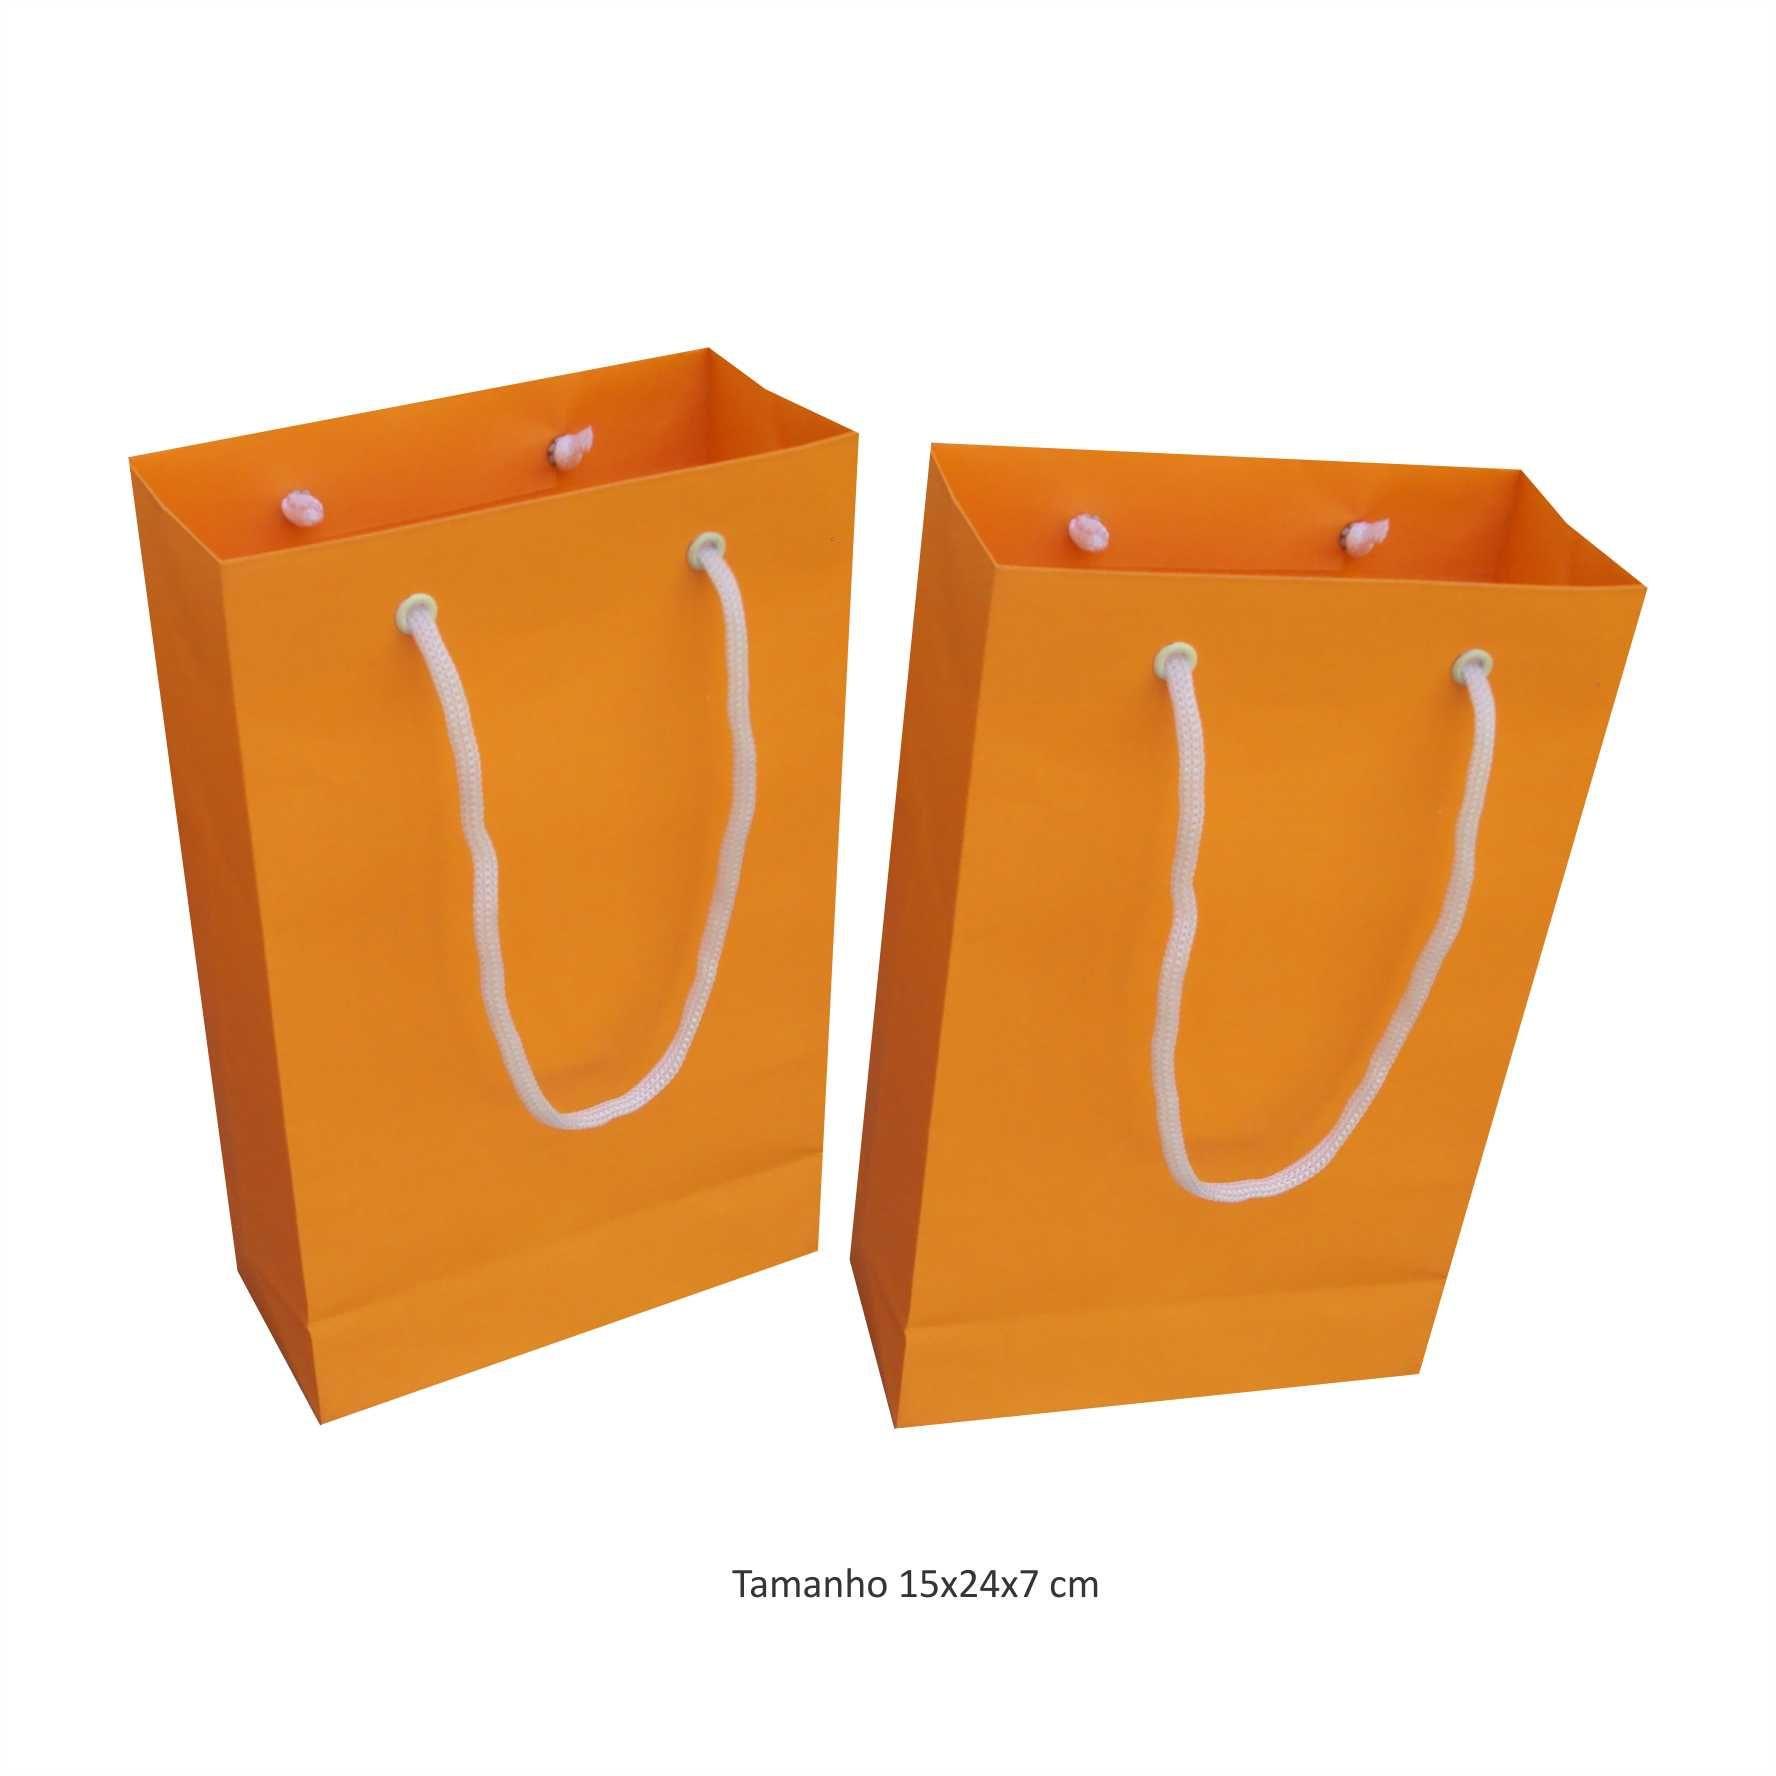 Sacola de papel (15x24x7 cm) pequena - laranja - 10 unidades